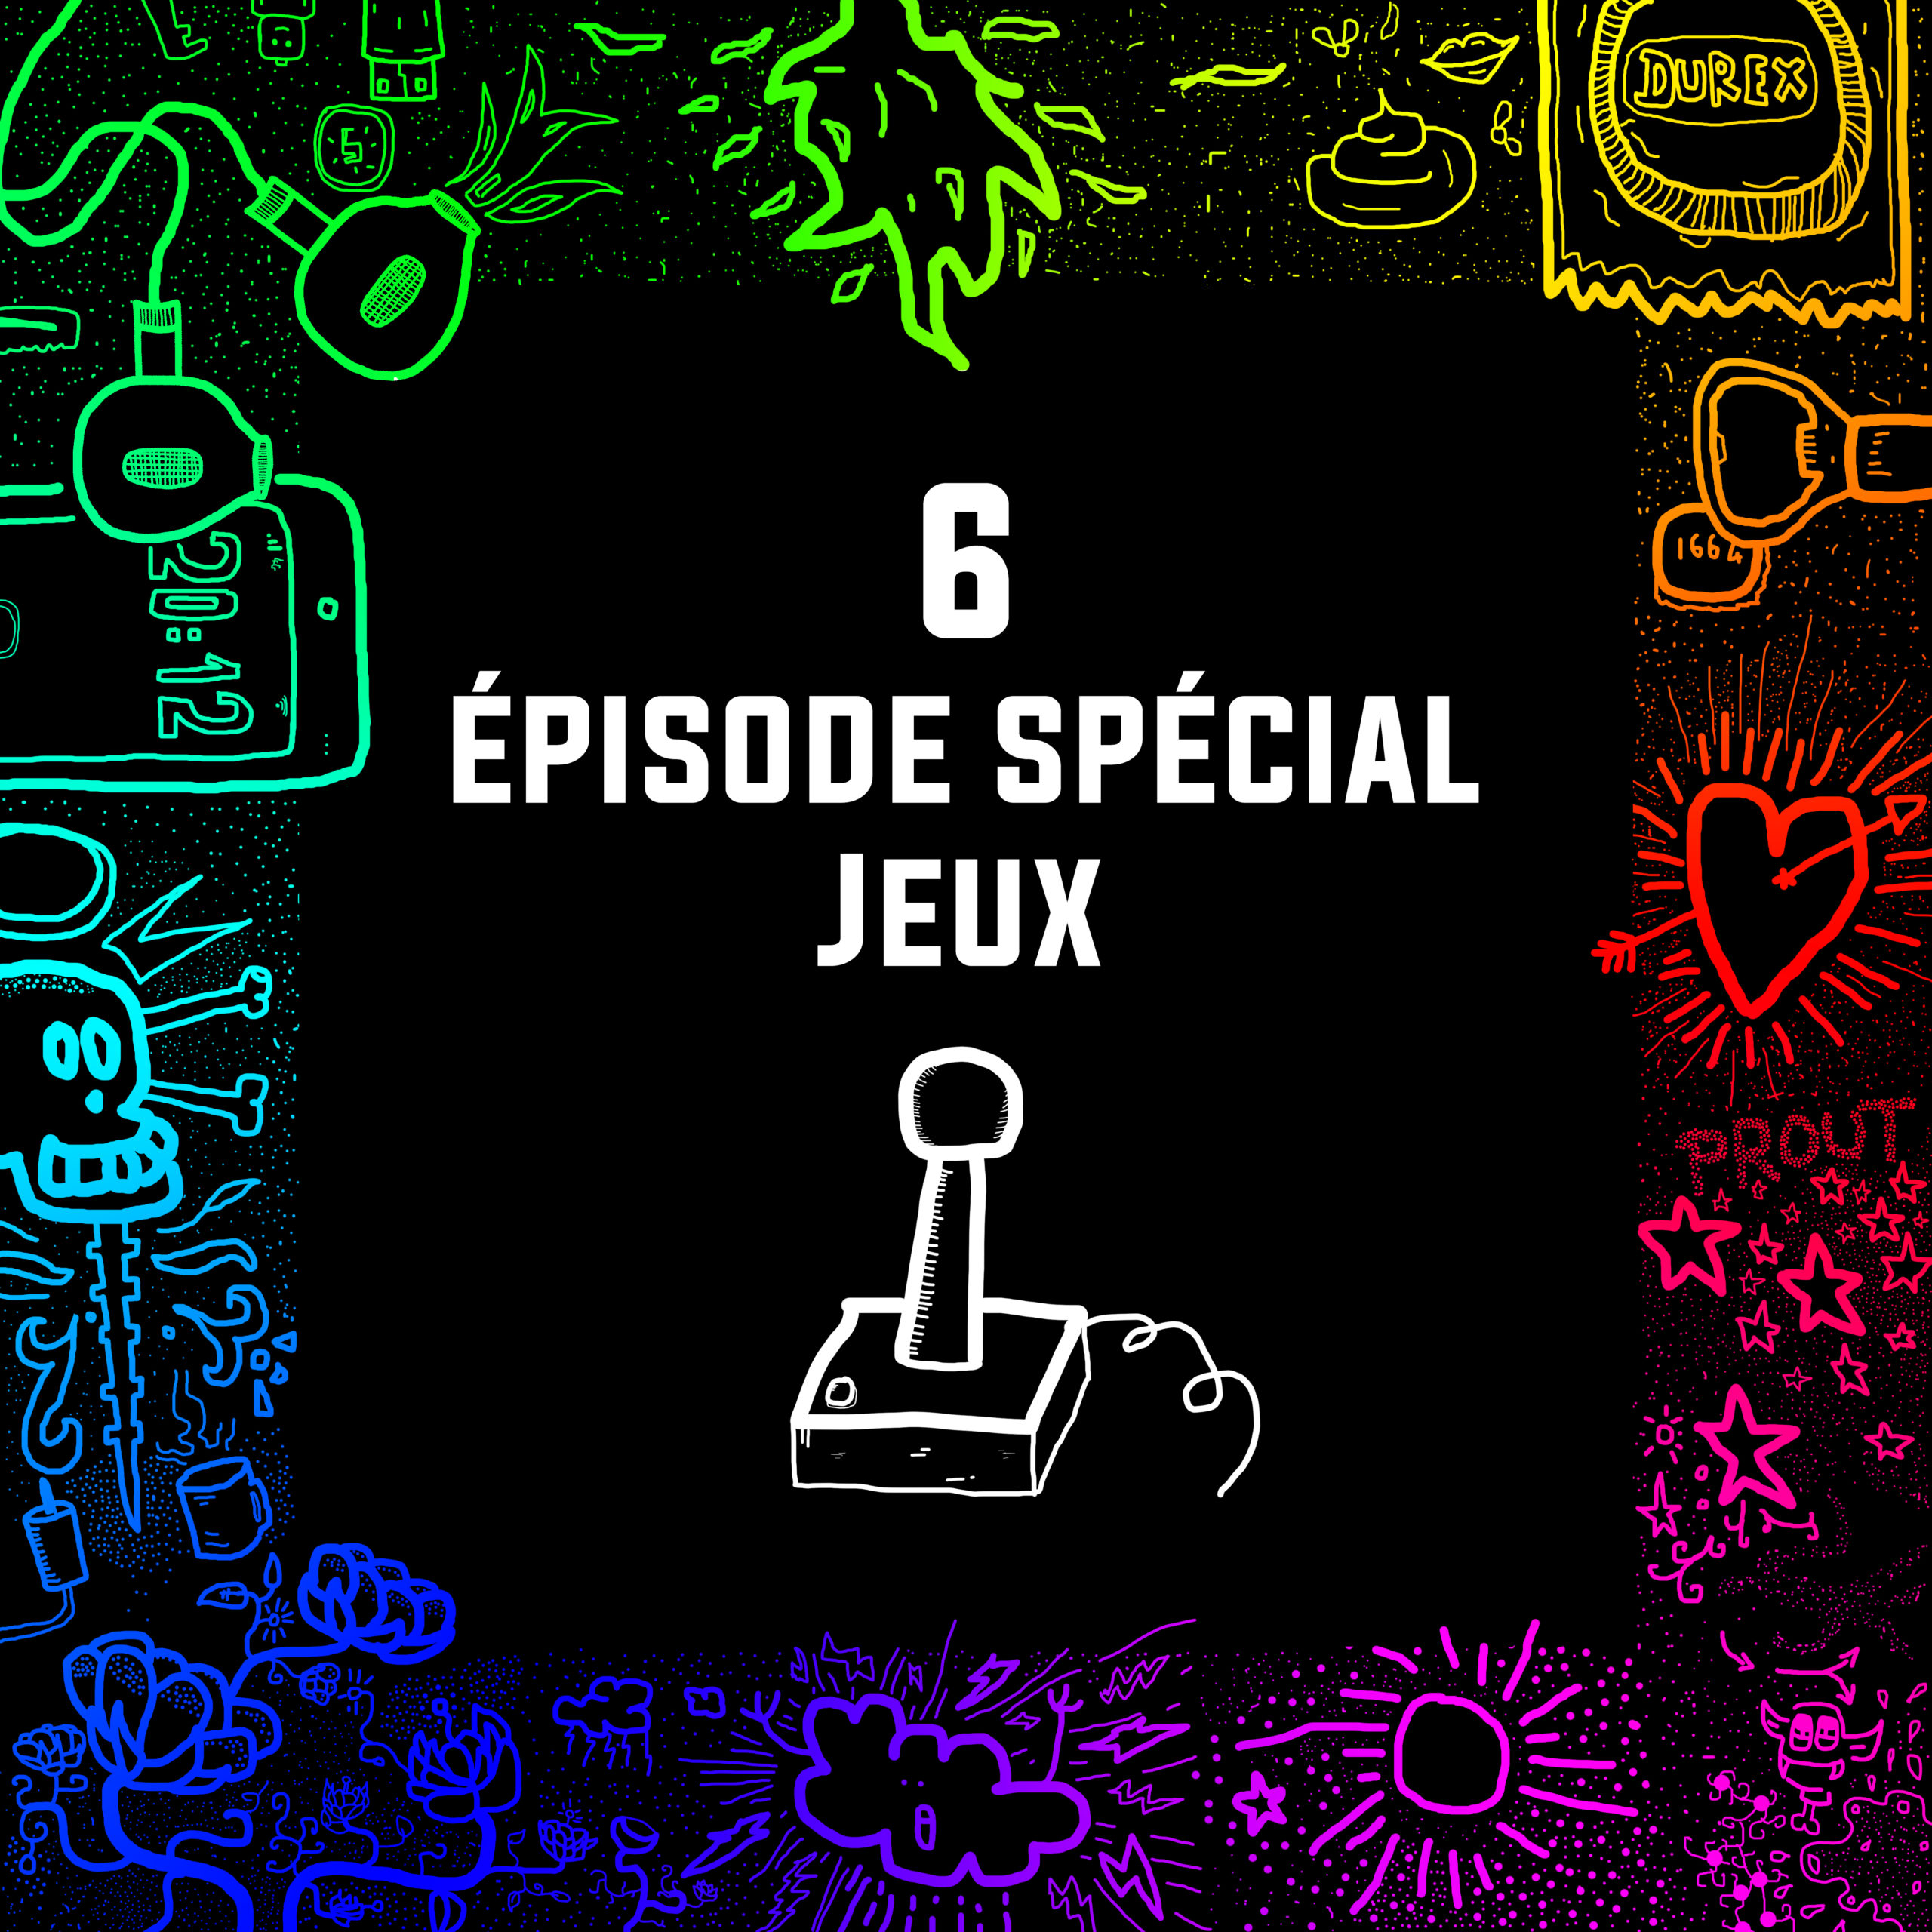 #06 – Episode Spécial Jeu